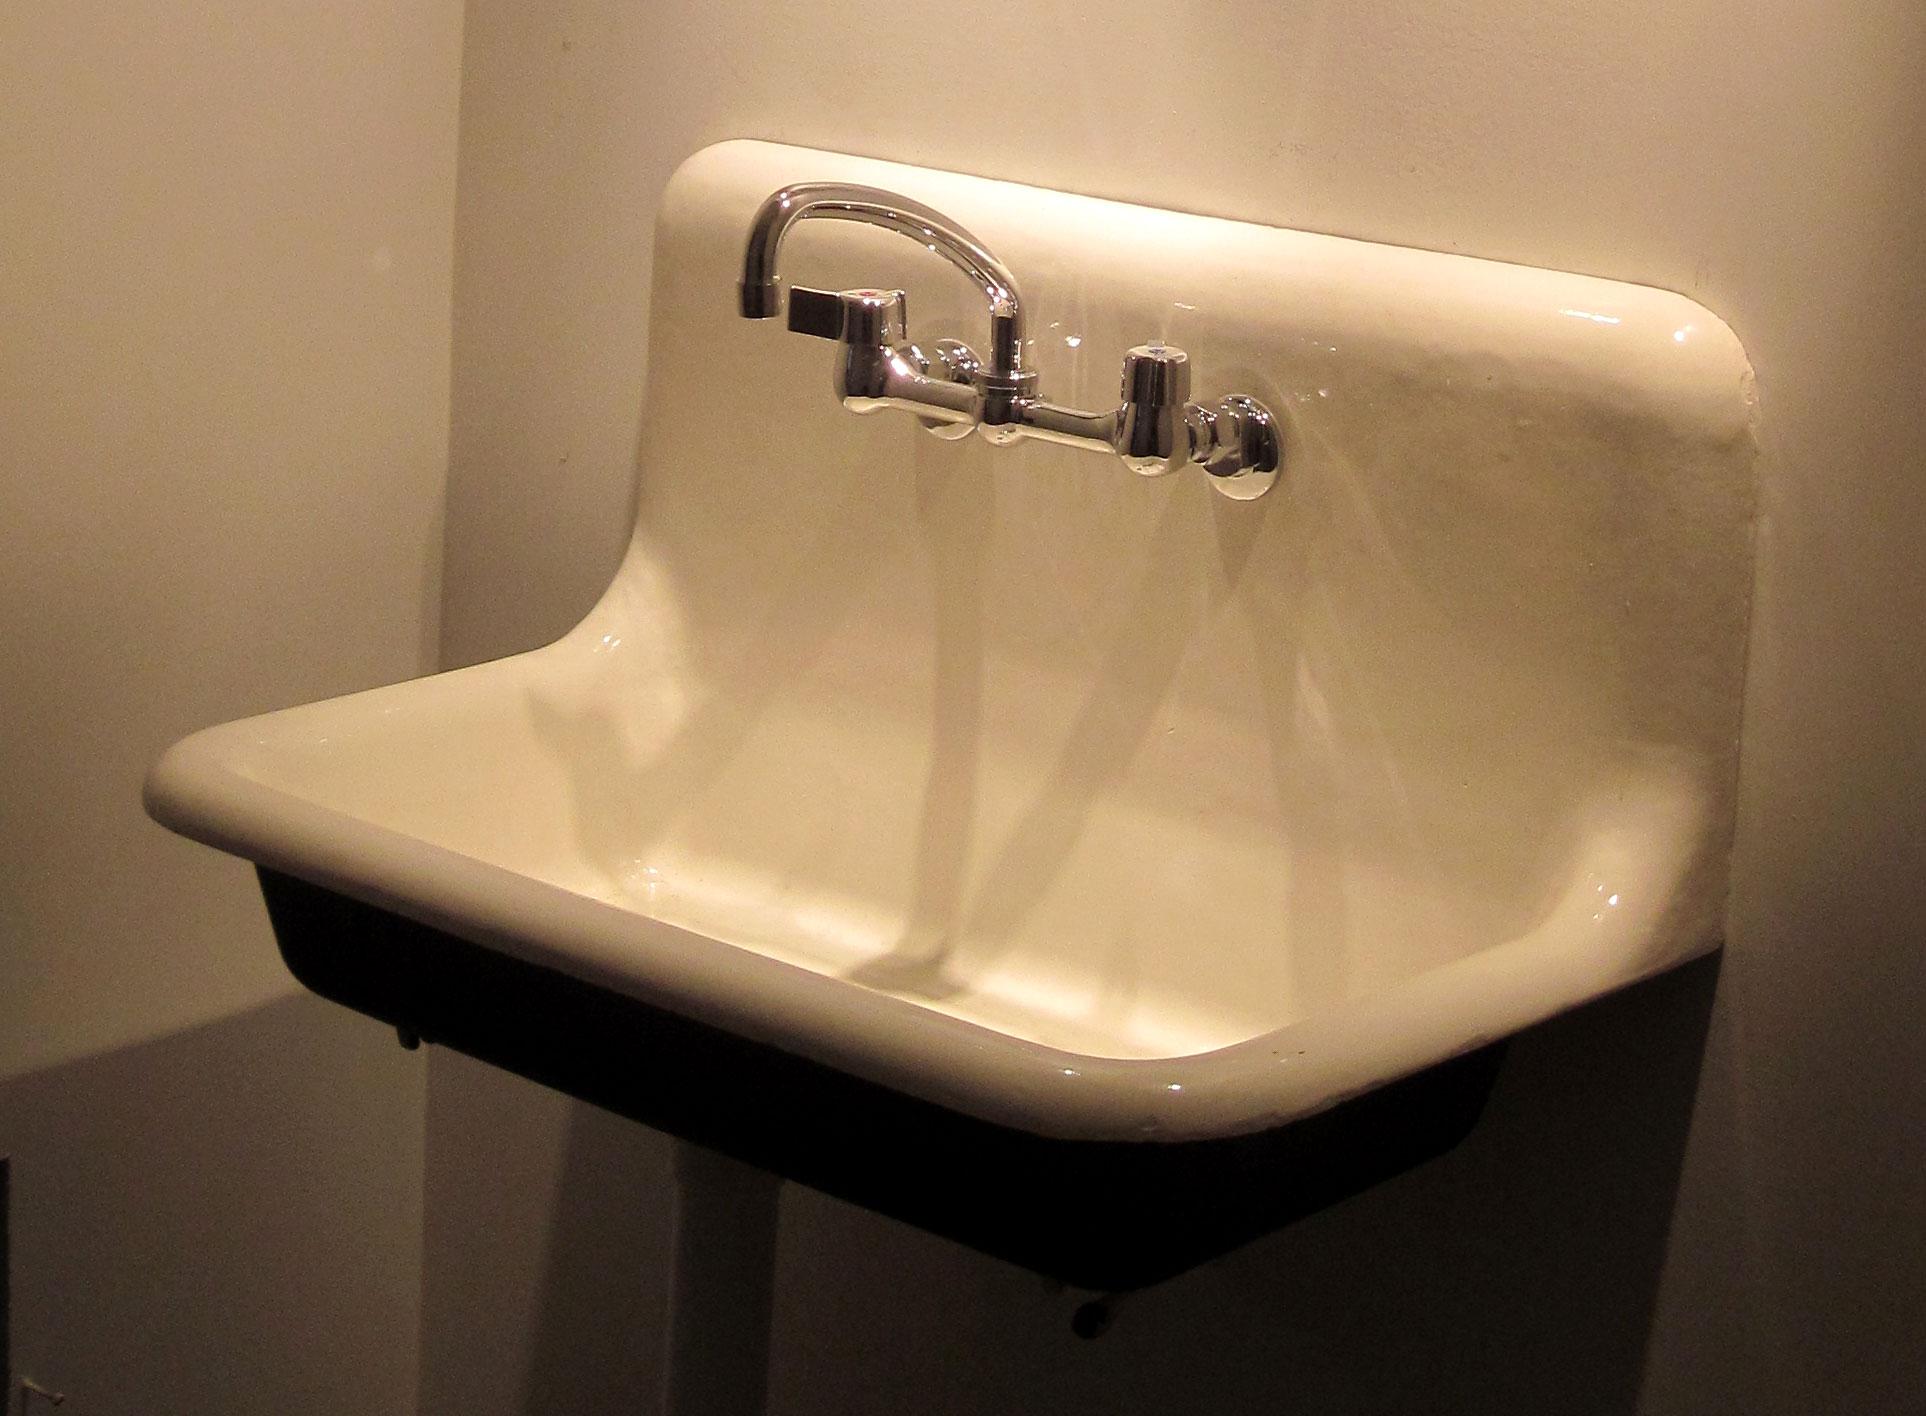 Cast Iron Sink As A Work Of Art  Statlerprojects's Blog